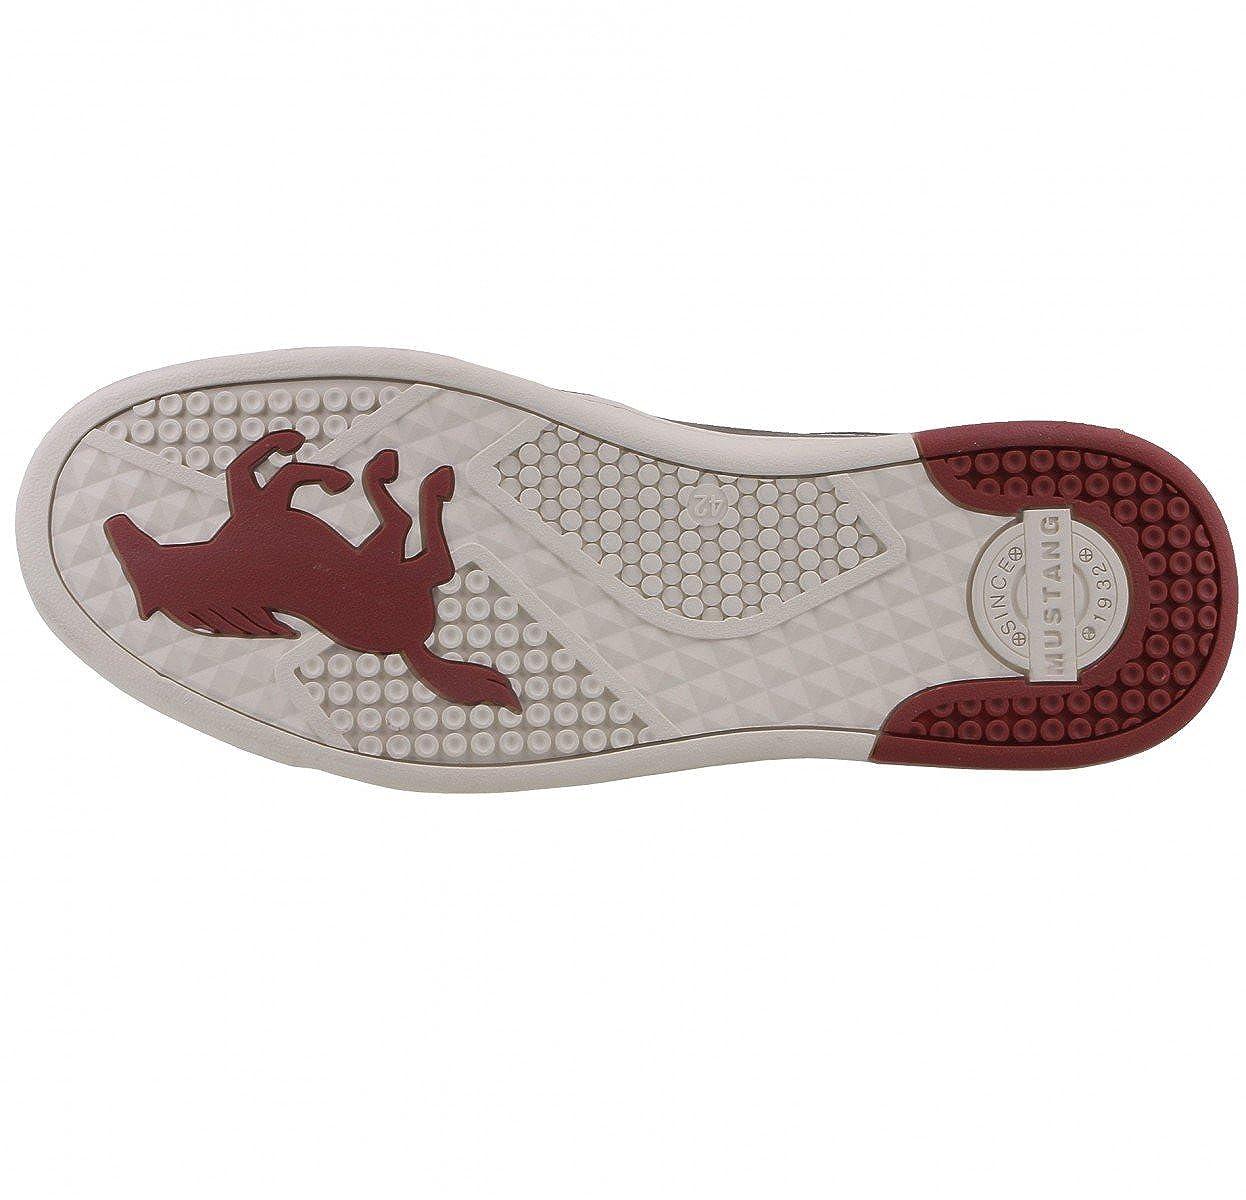 Herren Sneaker MUSTANG 4098-309-259 gris grafito 41 42 43 44 45 46, Herren Größen:44;Farben:grau